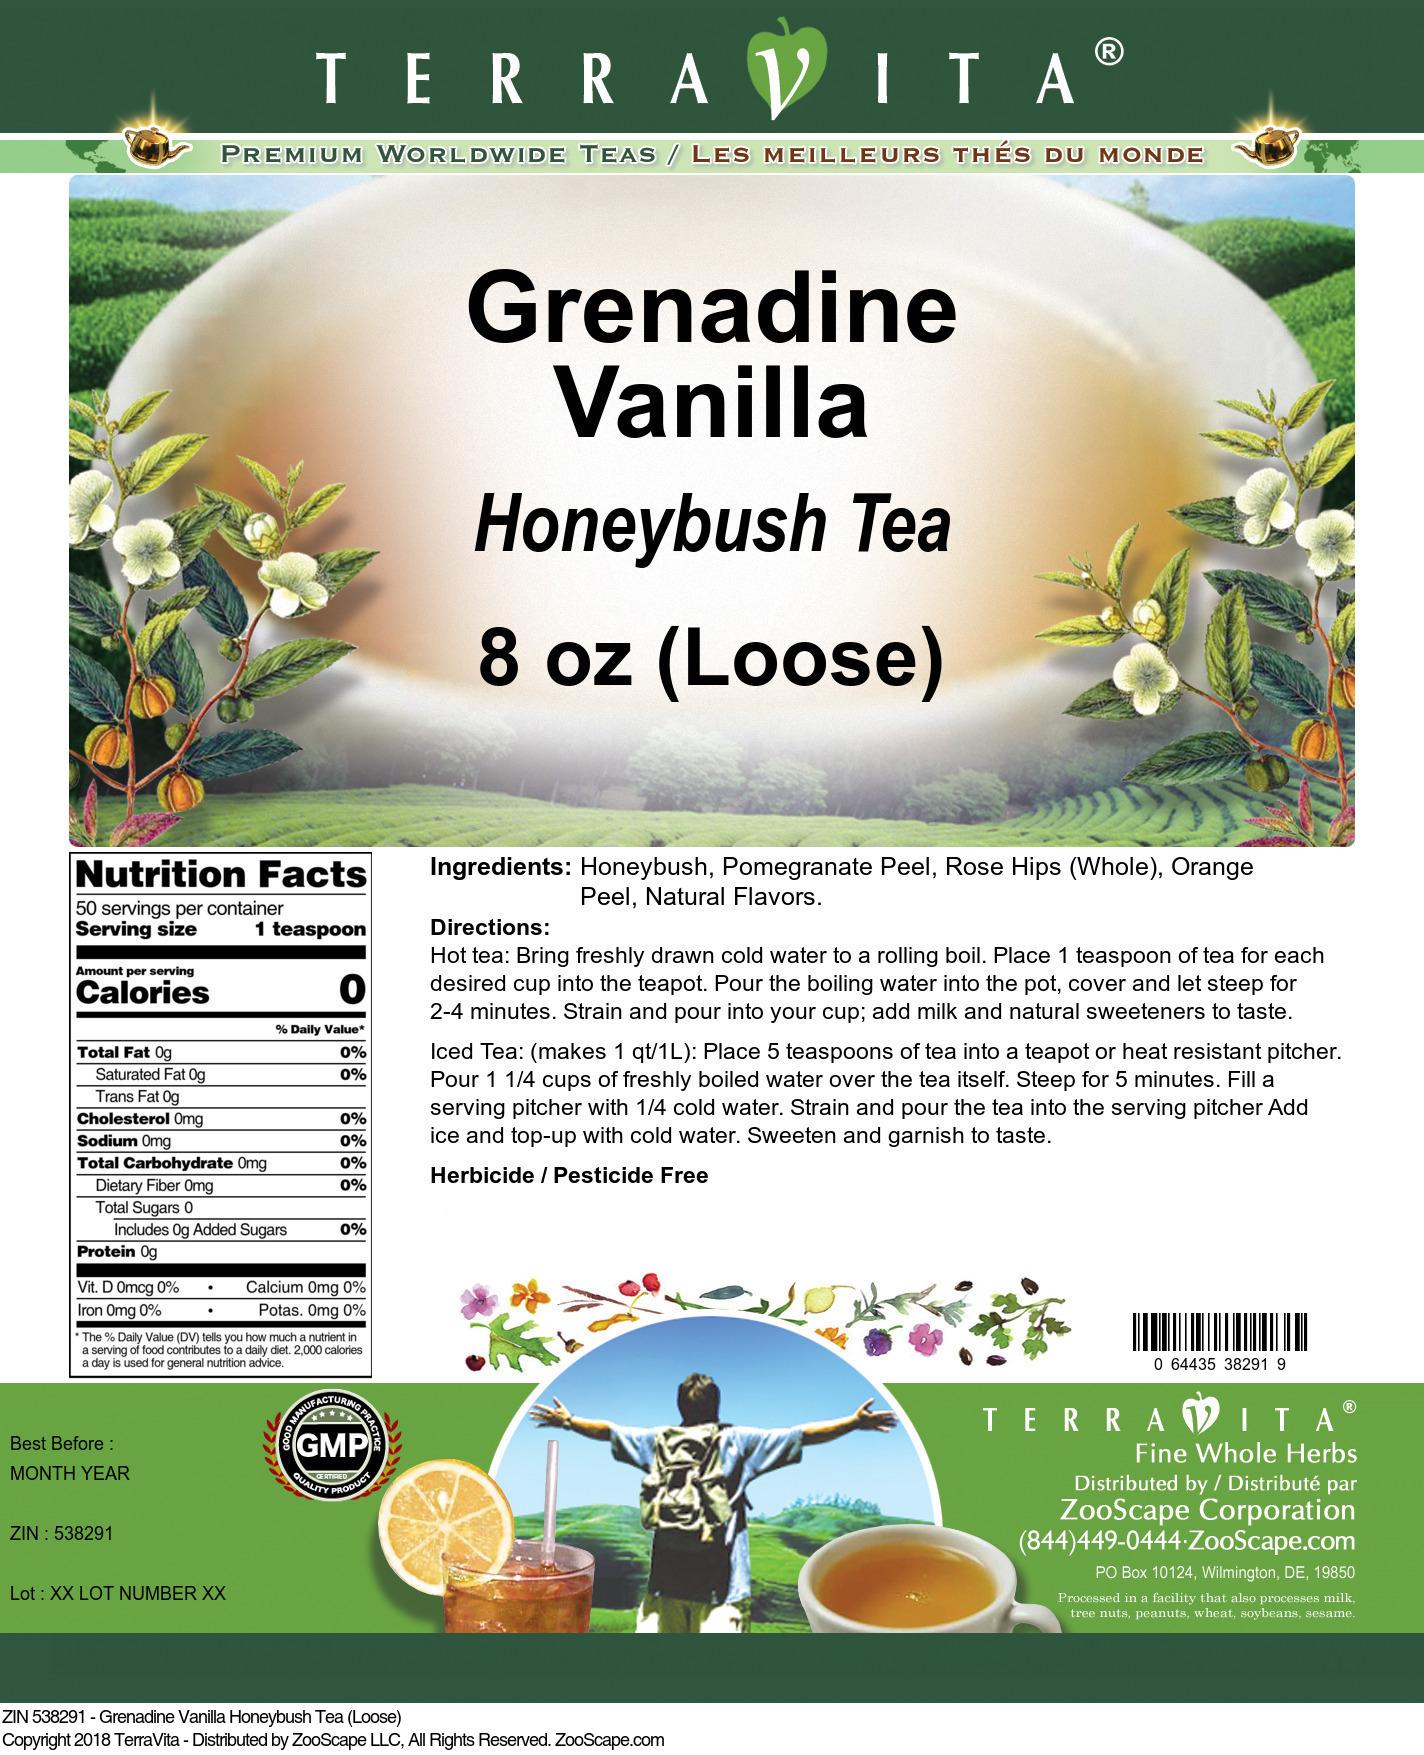 Grenadine Vanilla Honeybush Tea